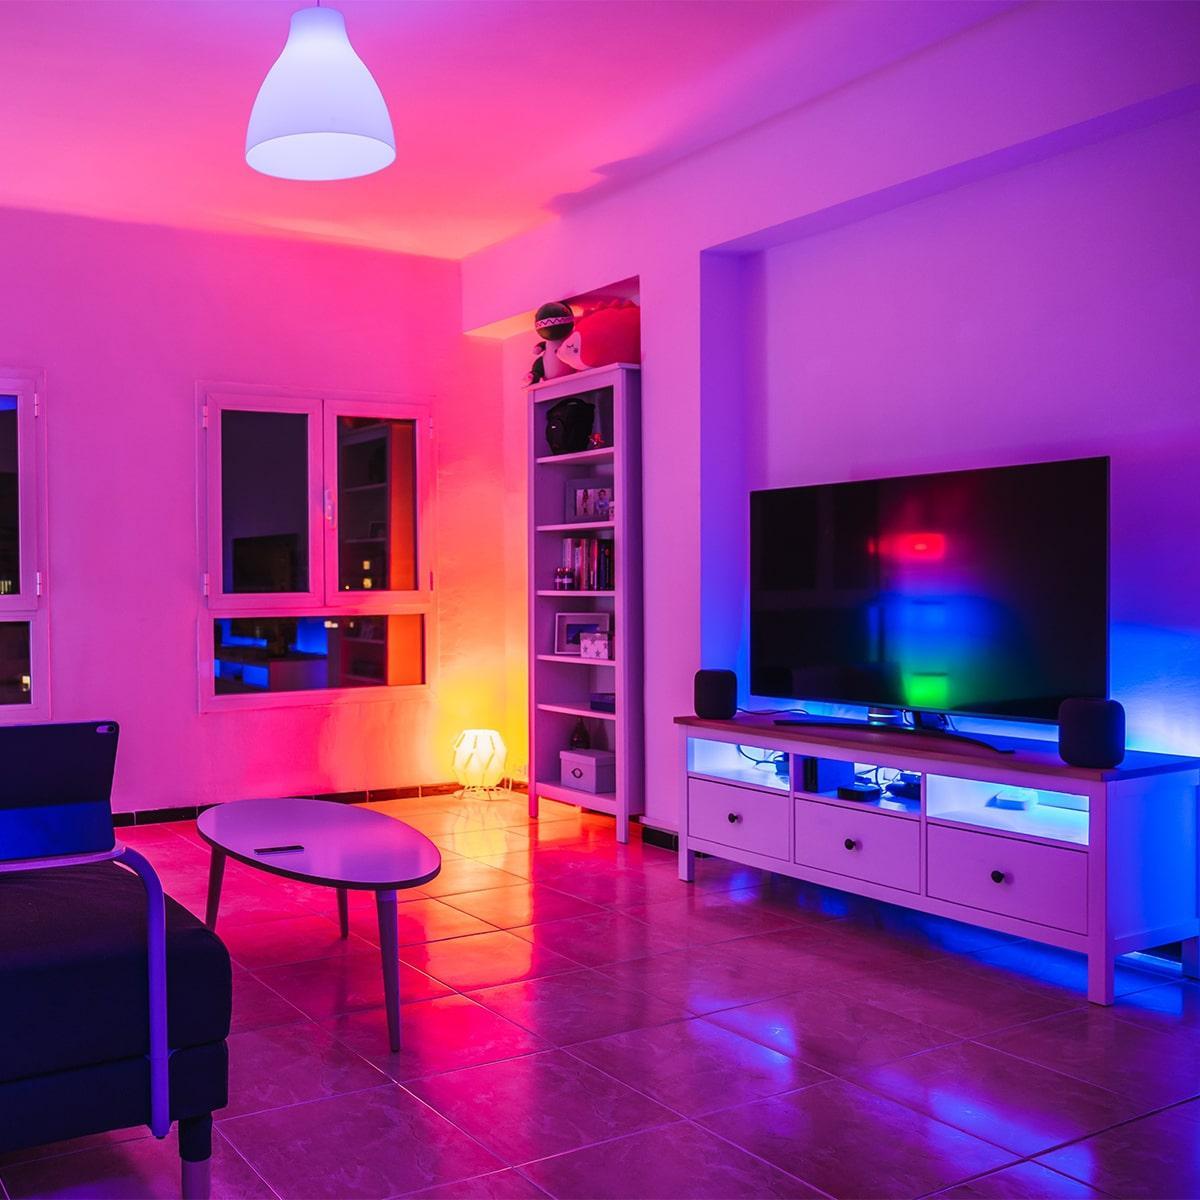 COB RGB 24V LED Streifen 5M 10W/m 840LED/m IP20 Farbwechsel